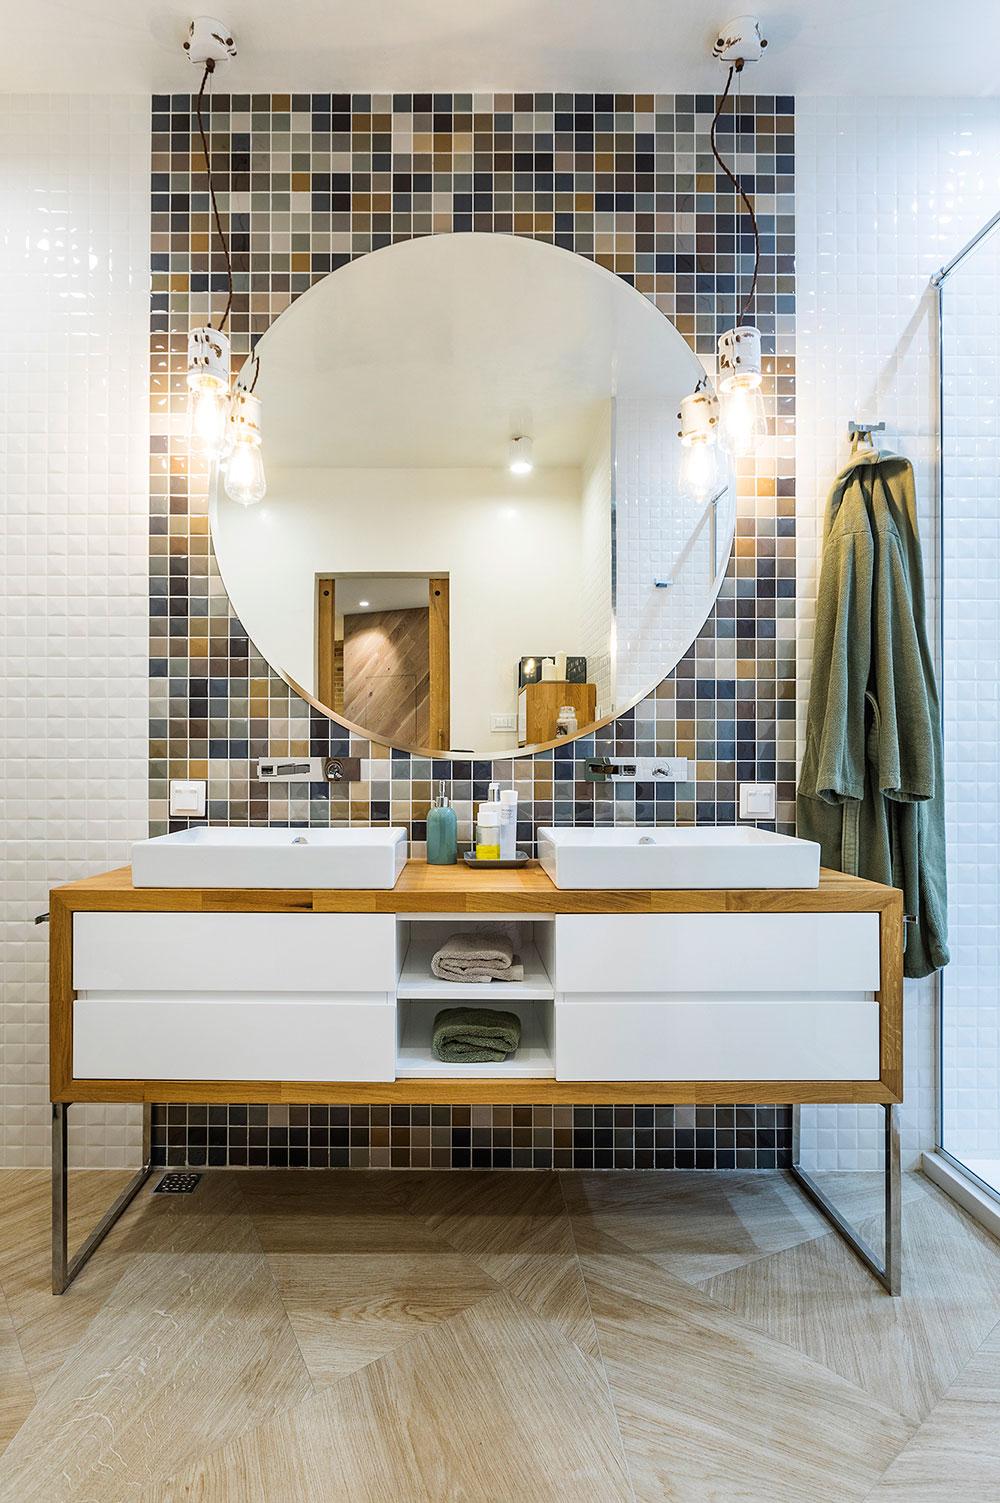 Bathroom vanity with big round mirror